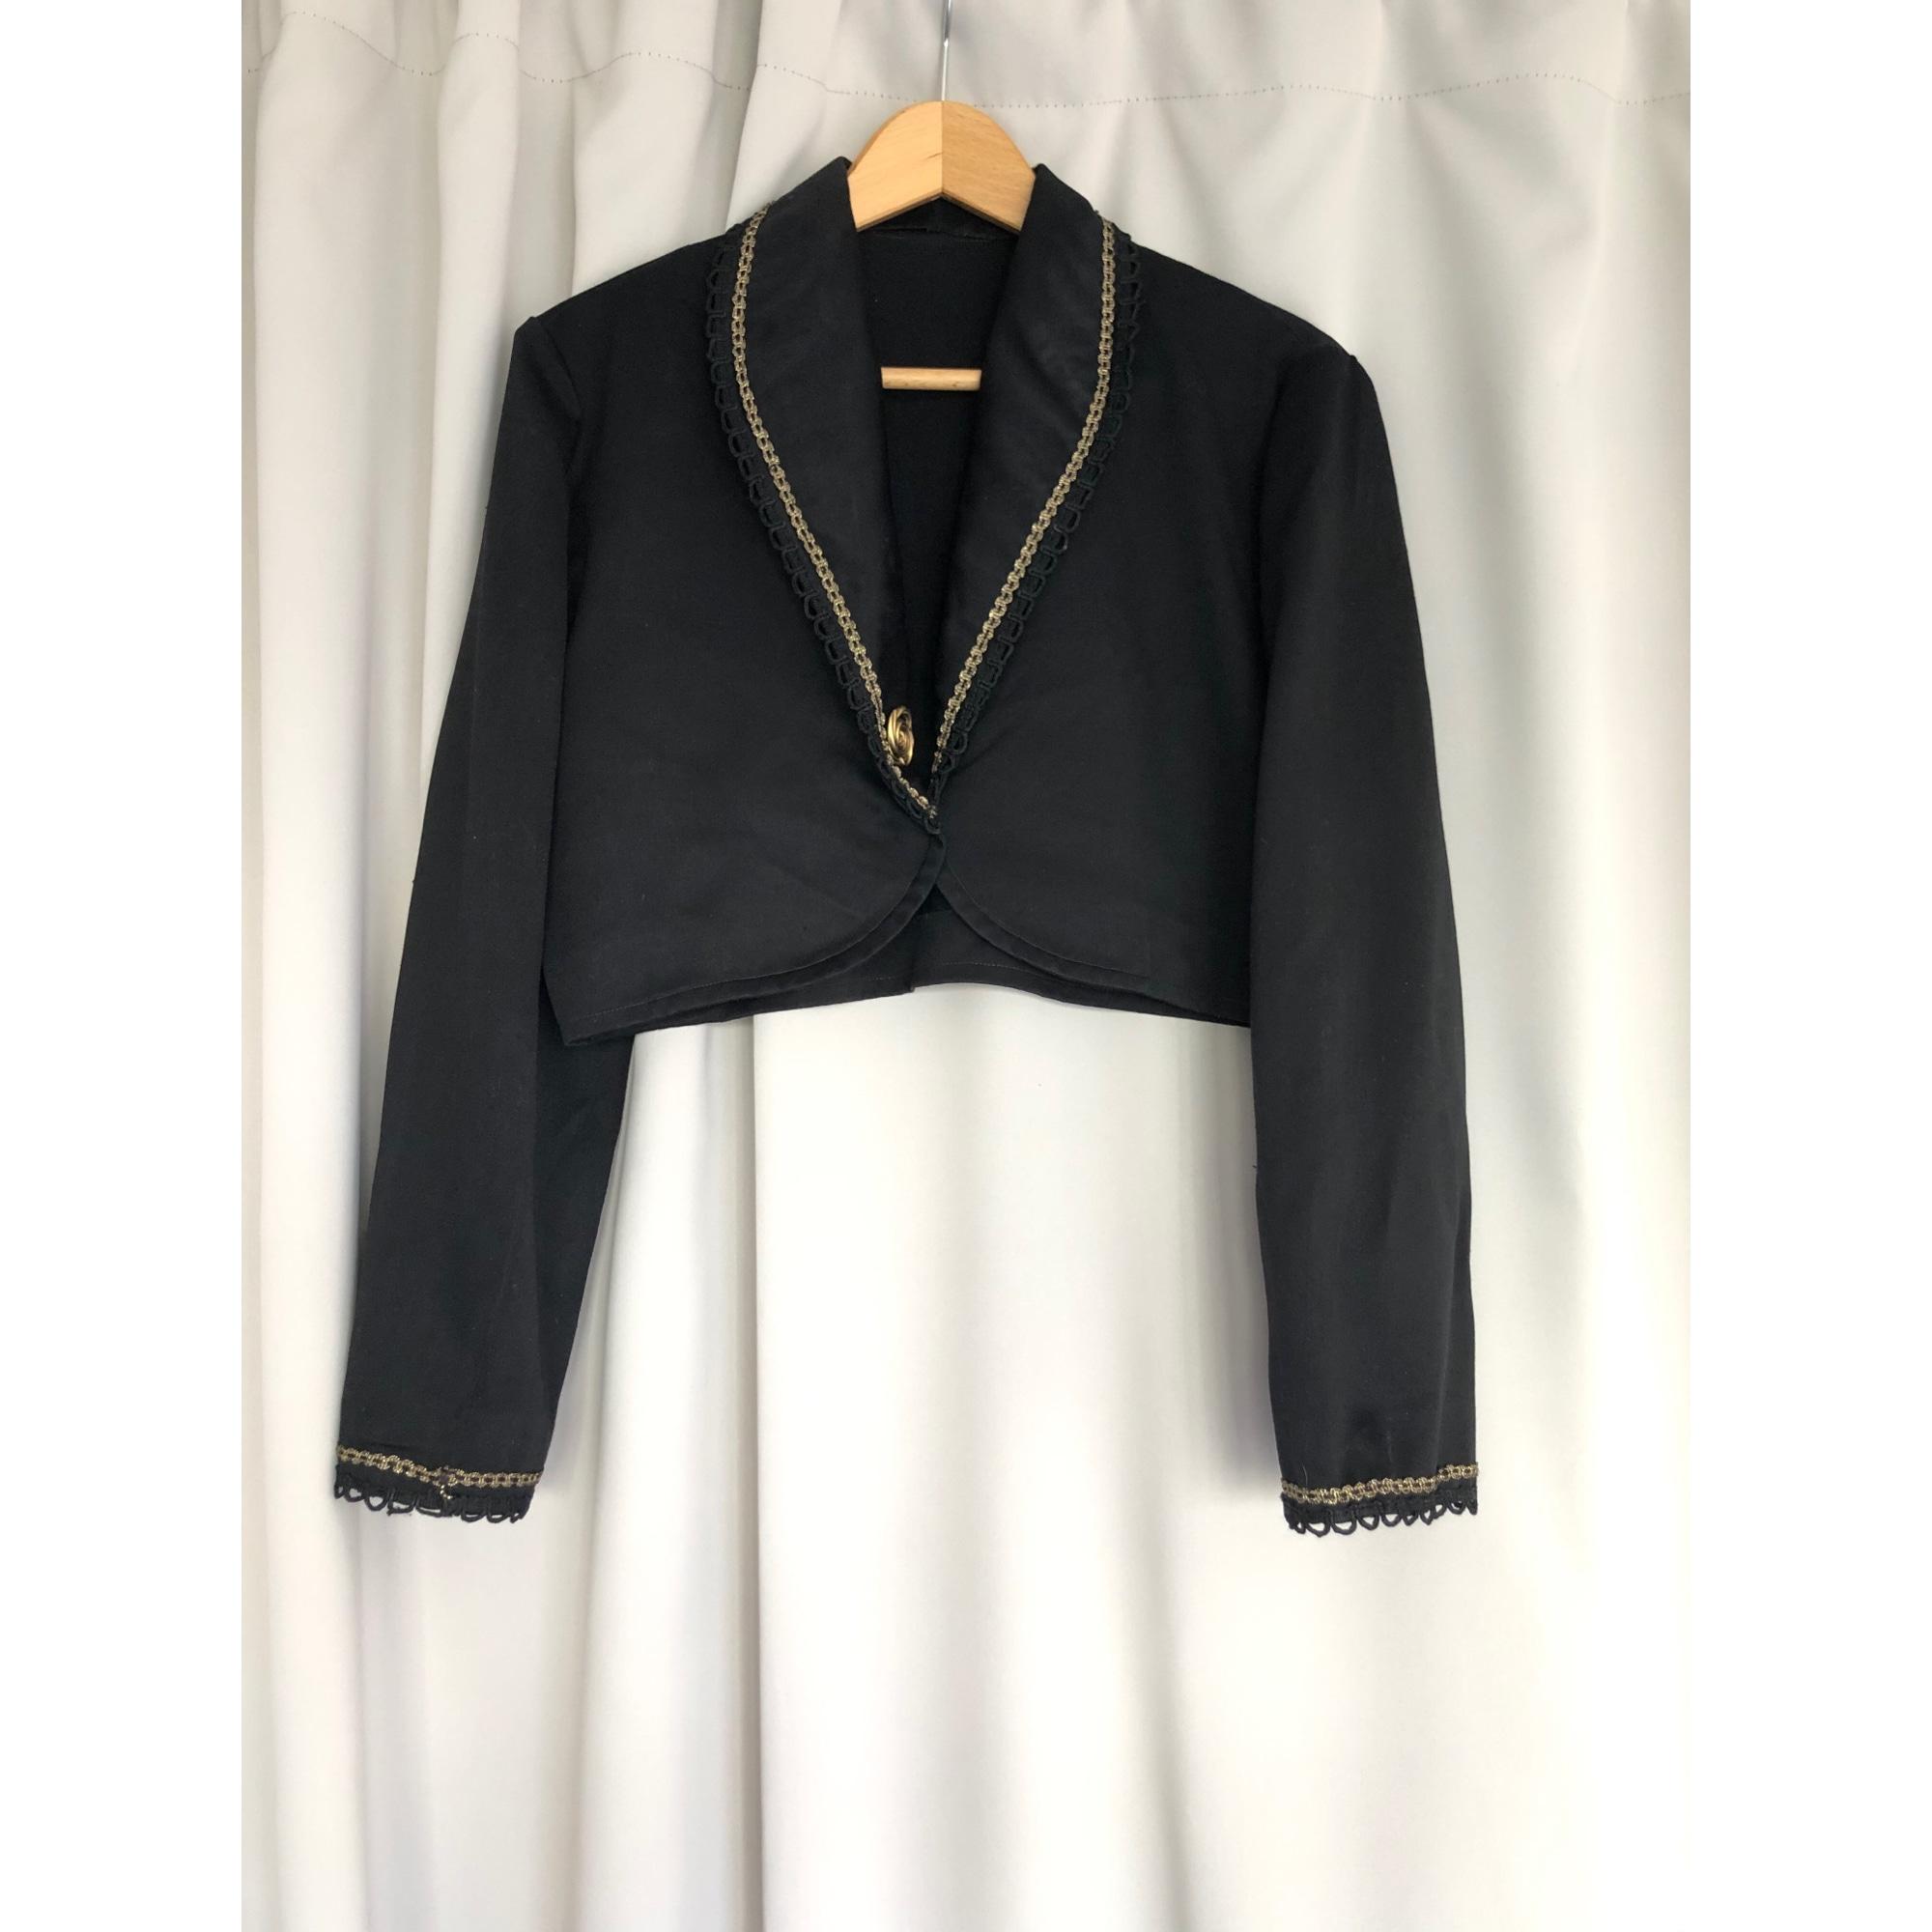 Blazer, veste tailleur VINTAGE Noir